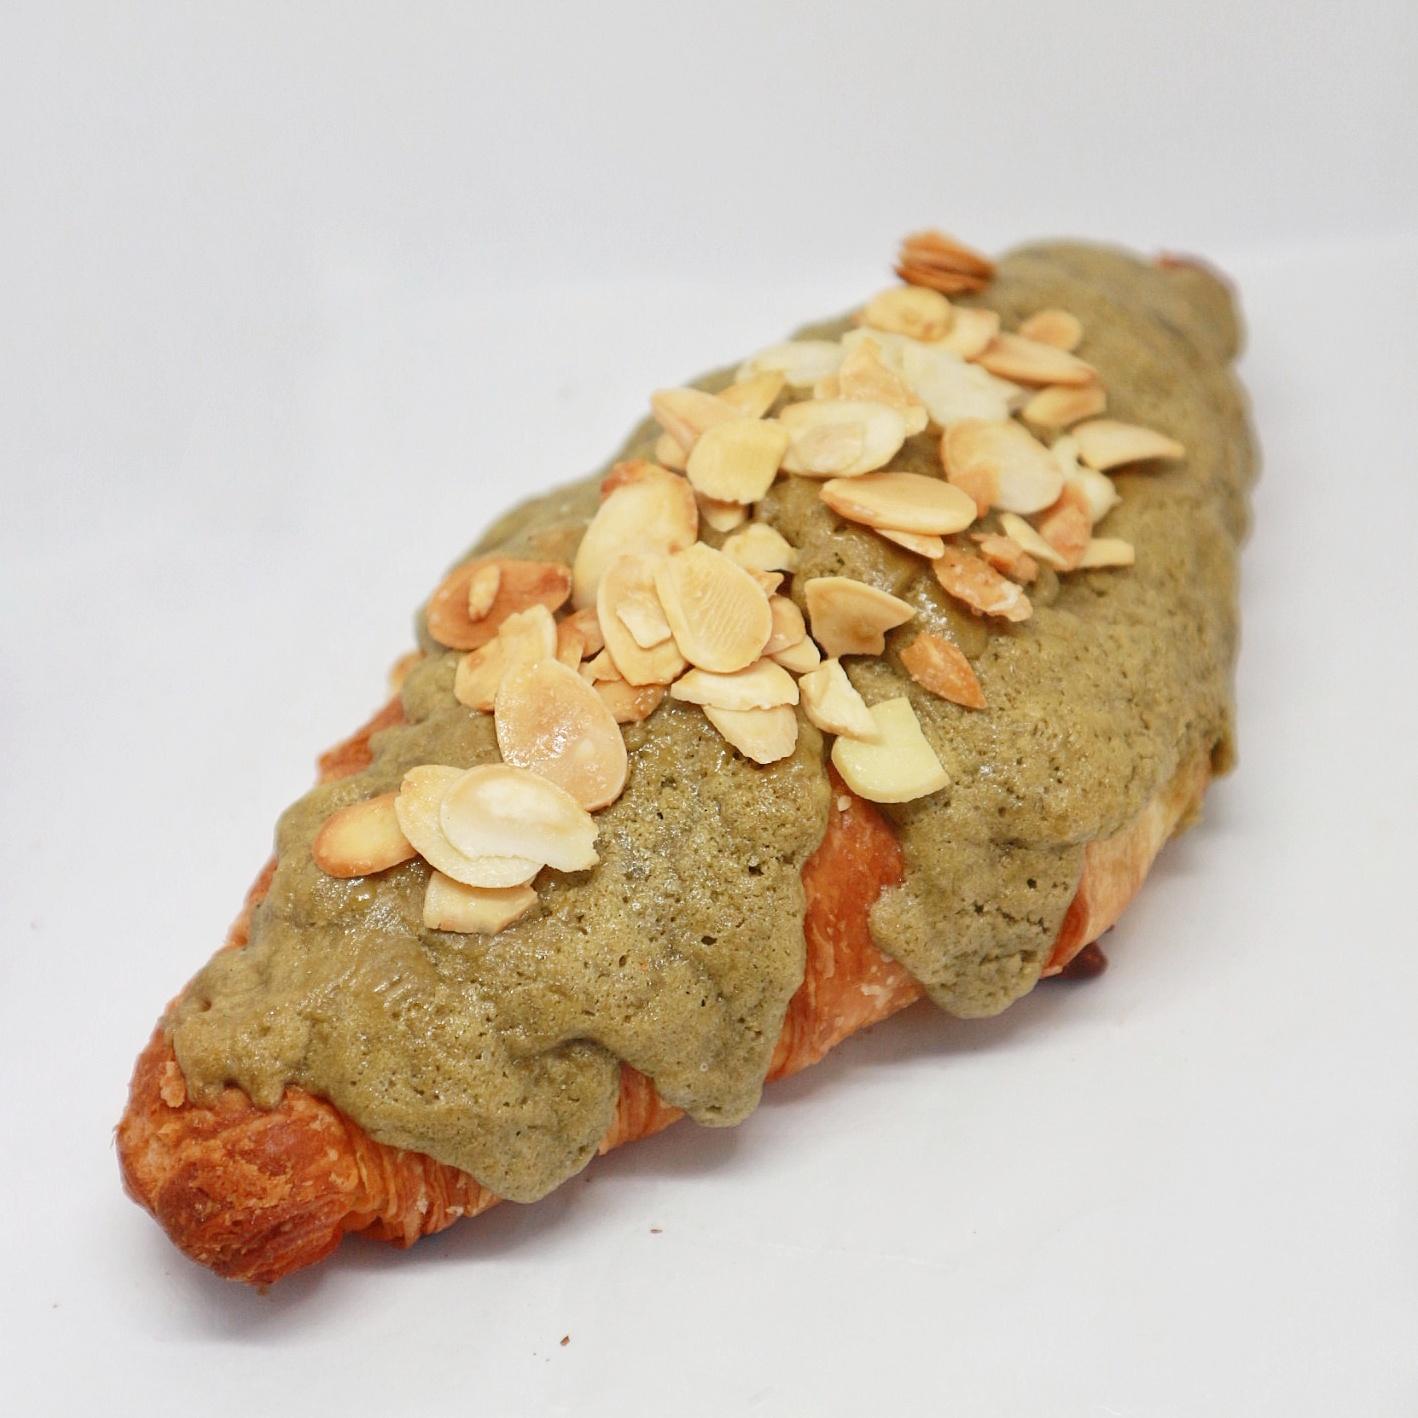 Matcha Almond Croissant - Rp. 20.000,-